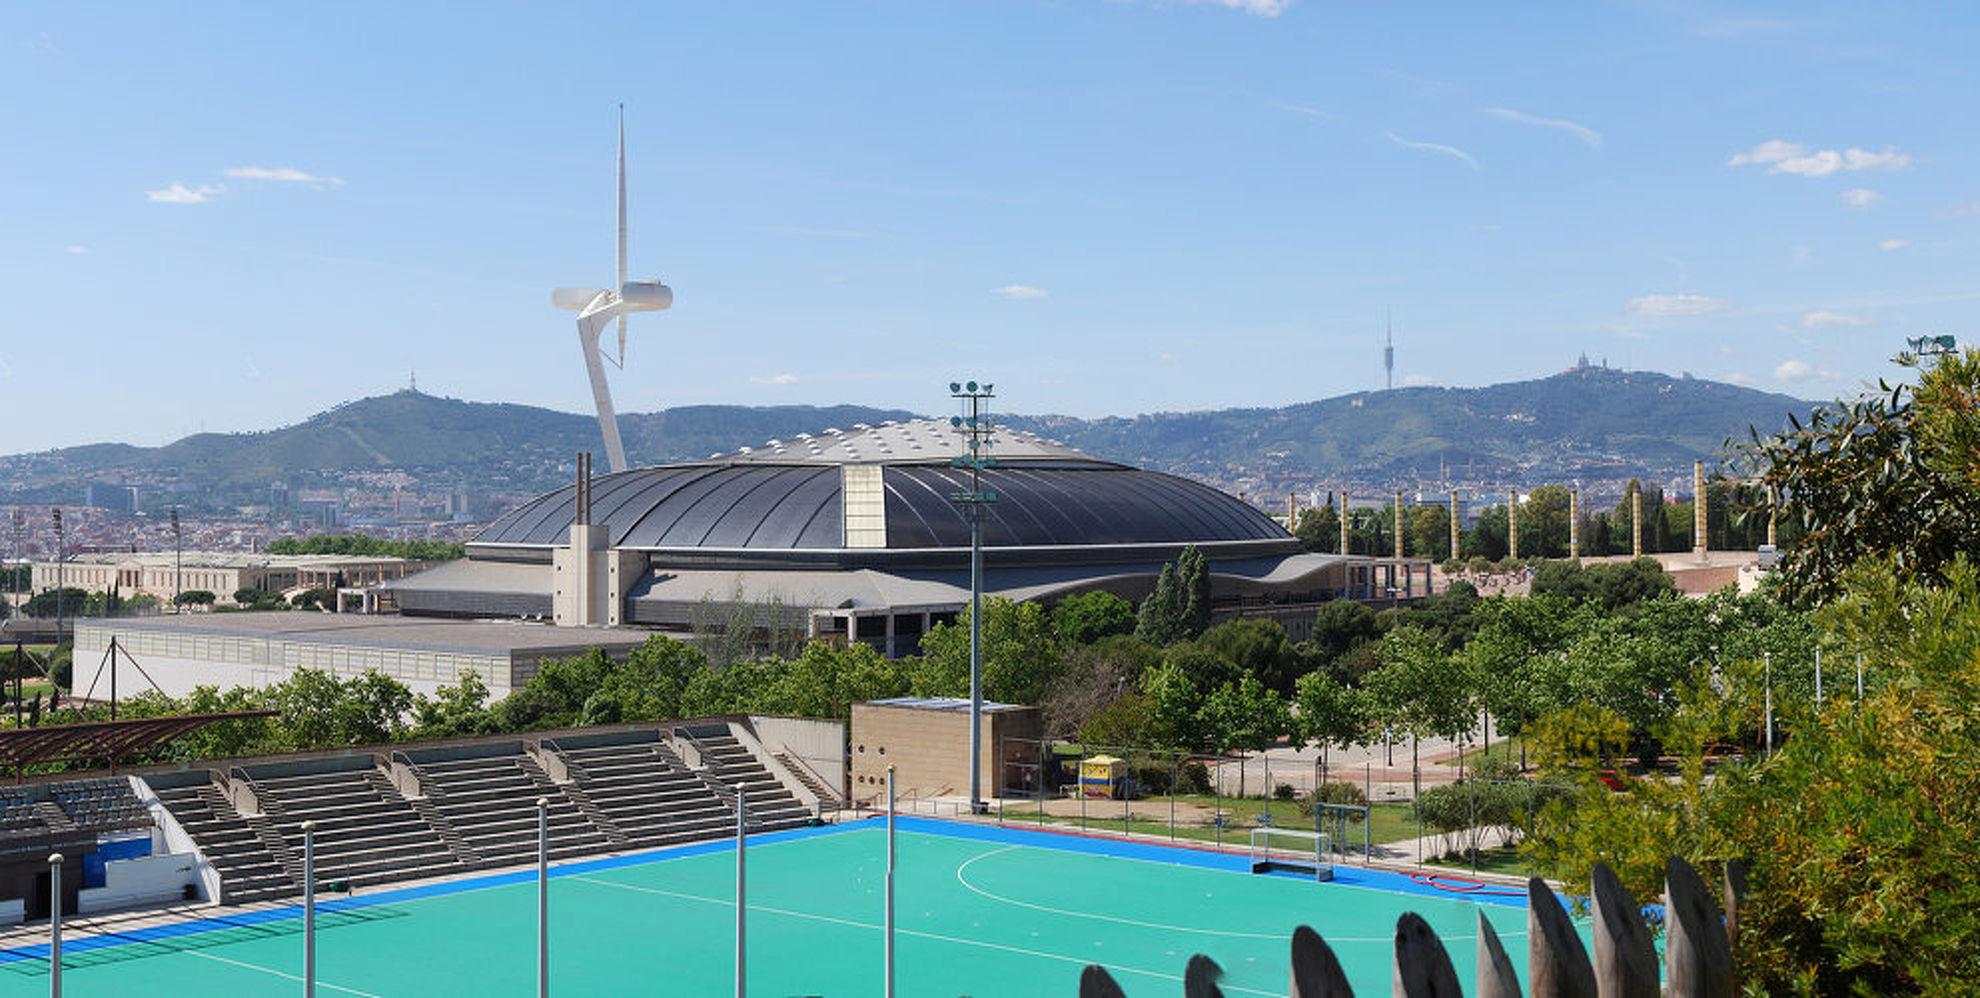 Explore Palau Sant Jordi Arena